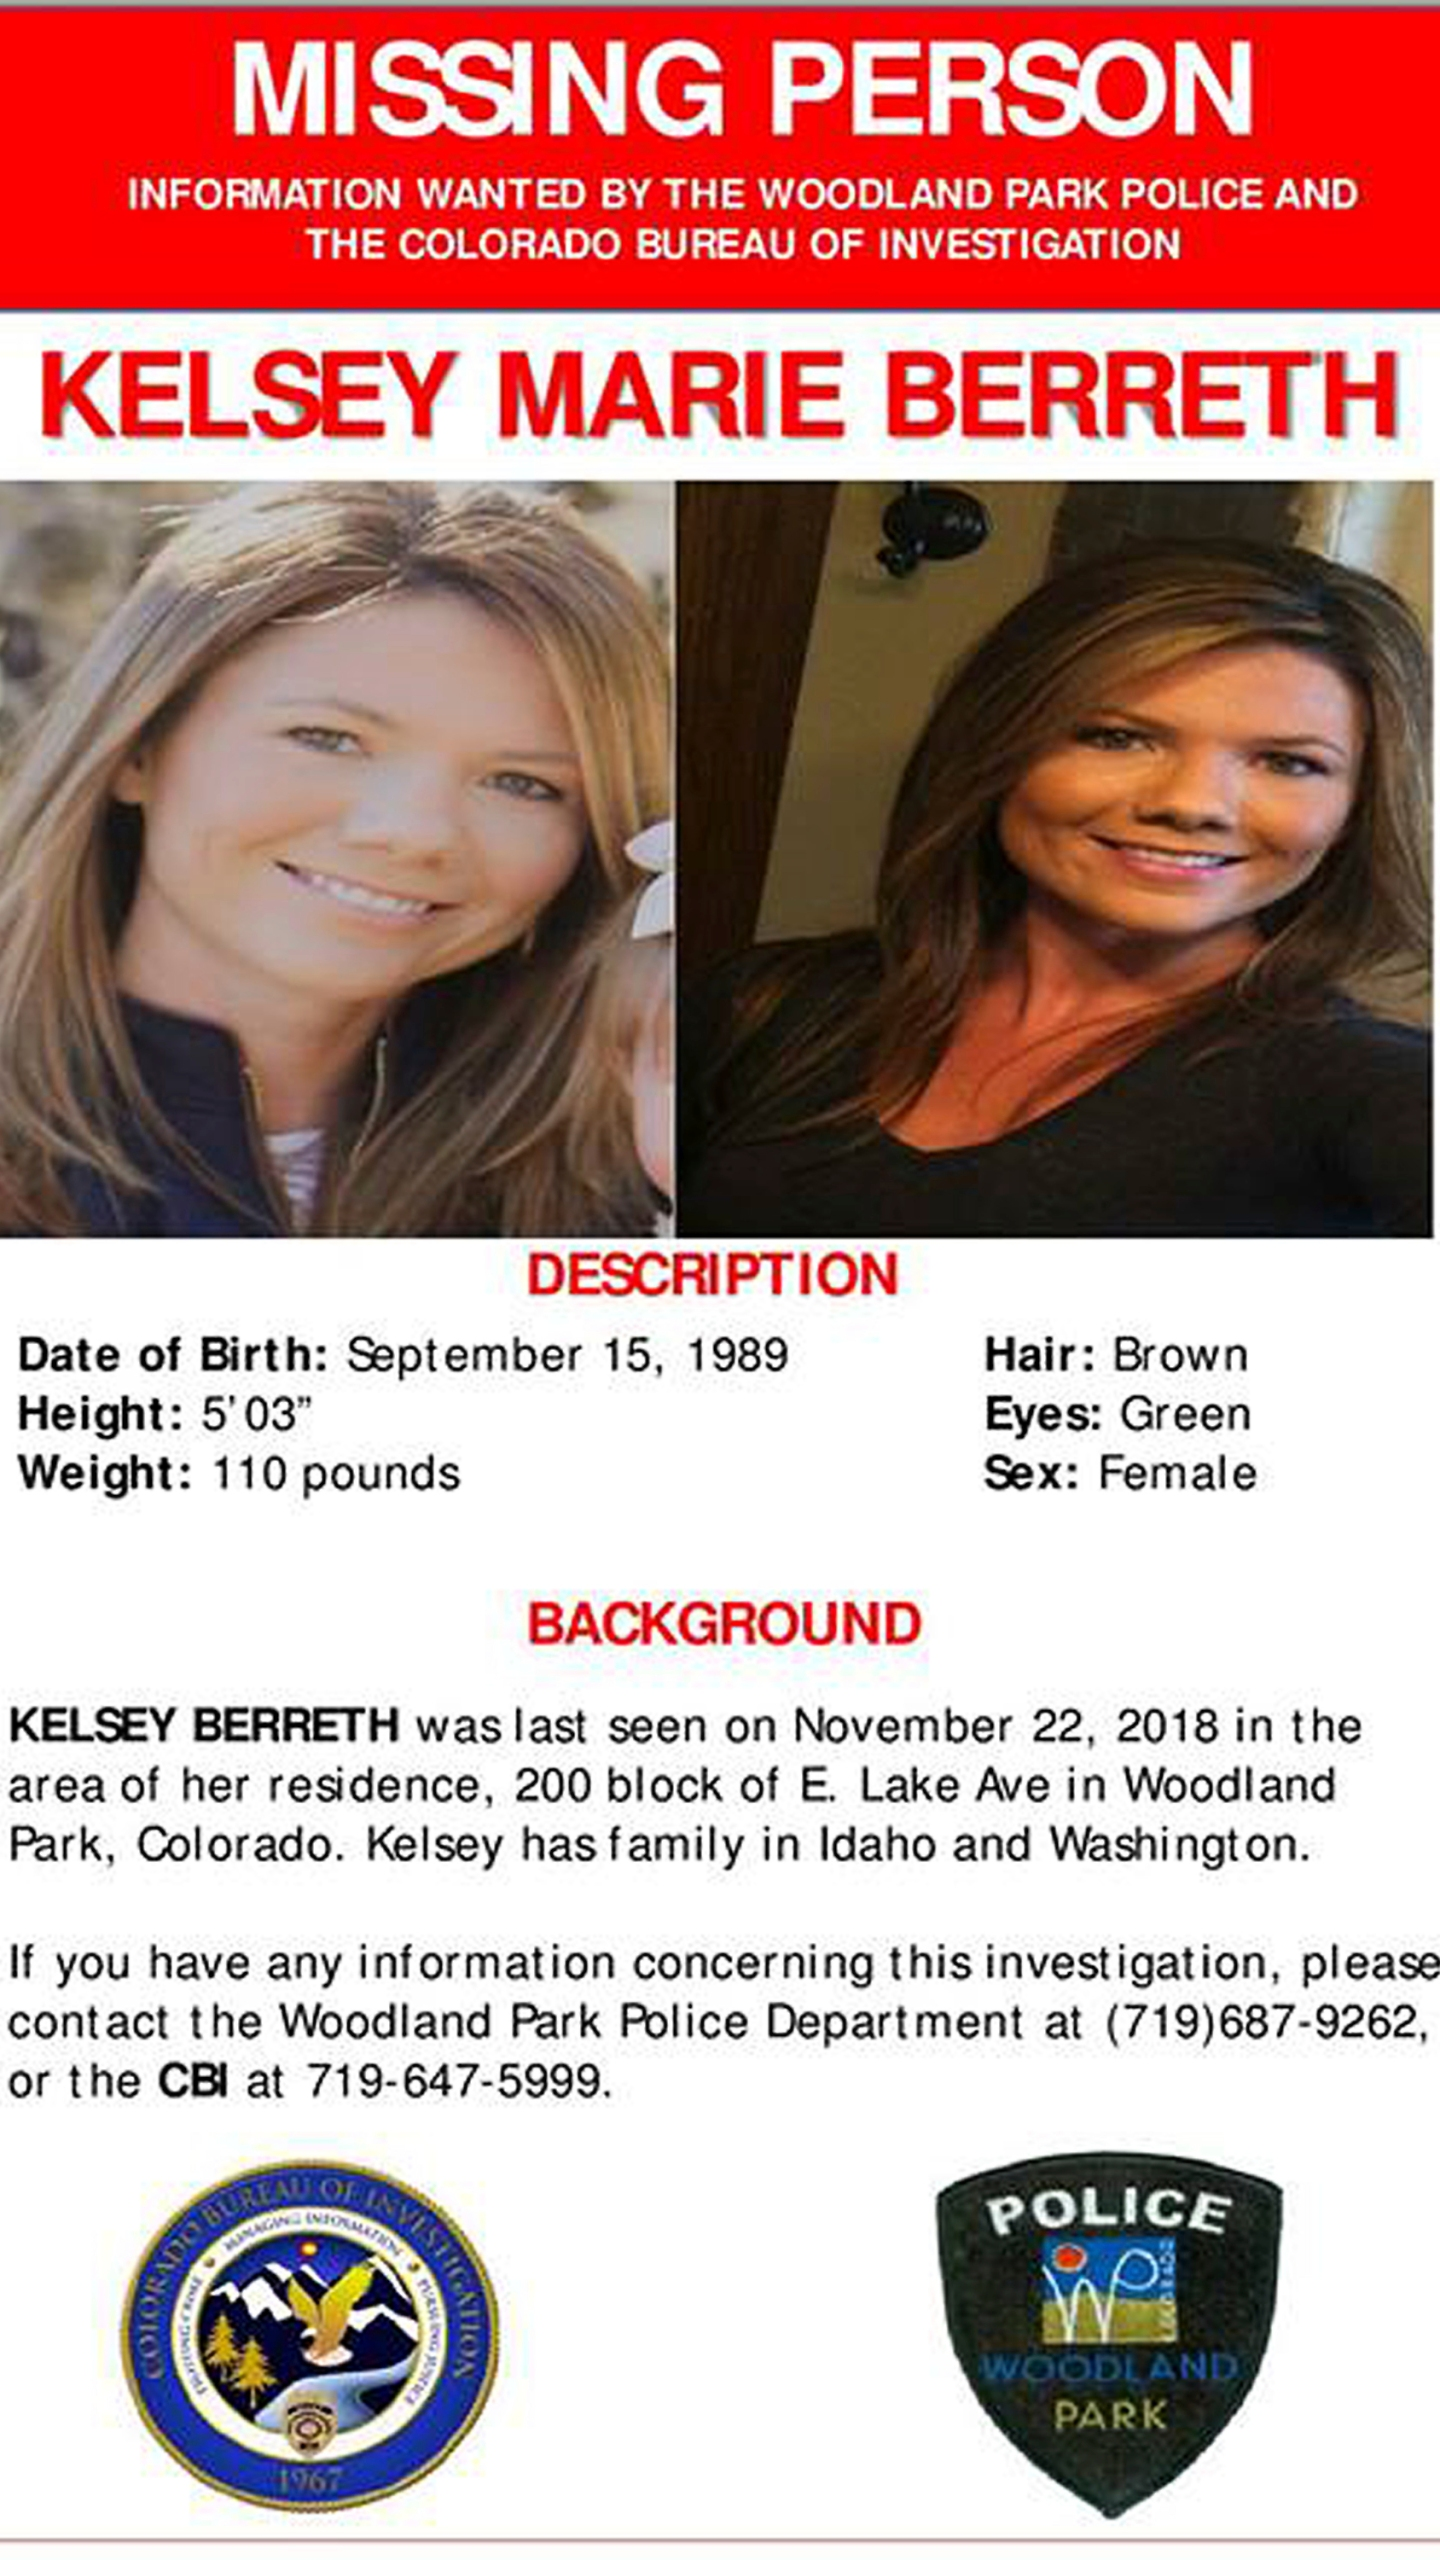 Missing_Woman_Colorado_94784-159532.jpg17921160